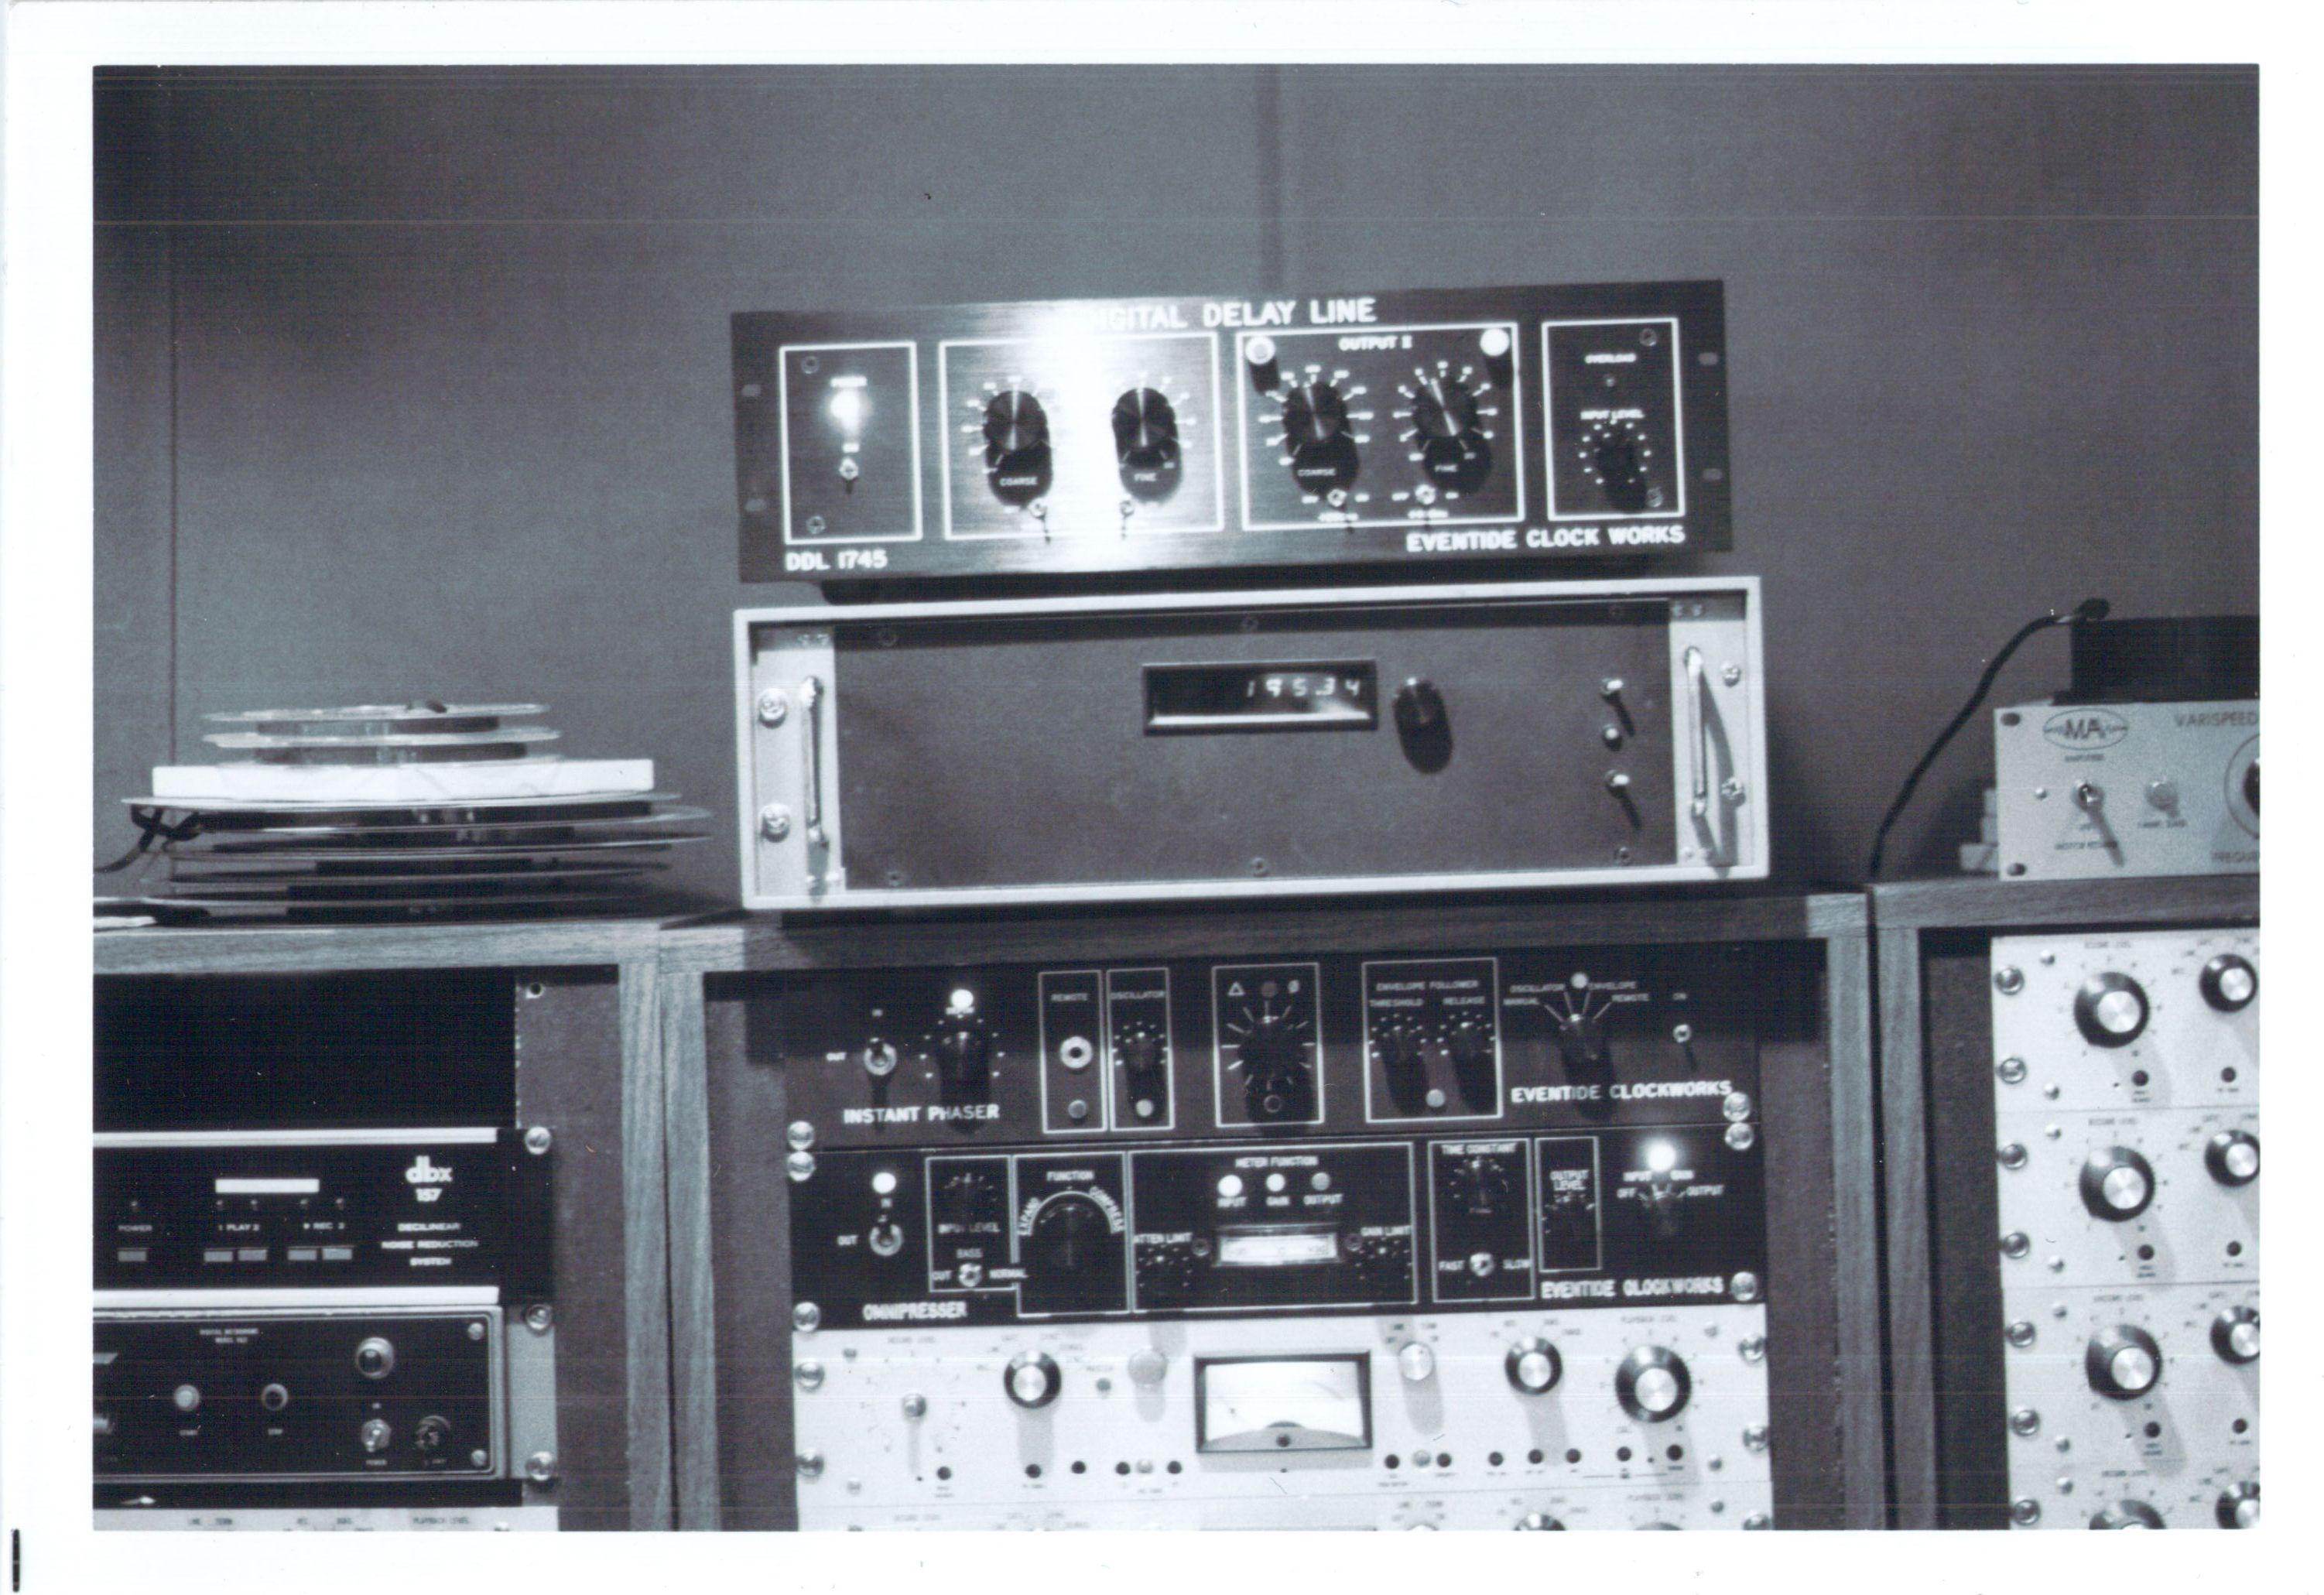 Omnipressor Prototype, Instant Phaser, and DDL 1745